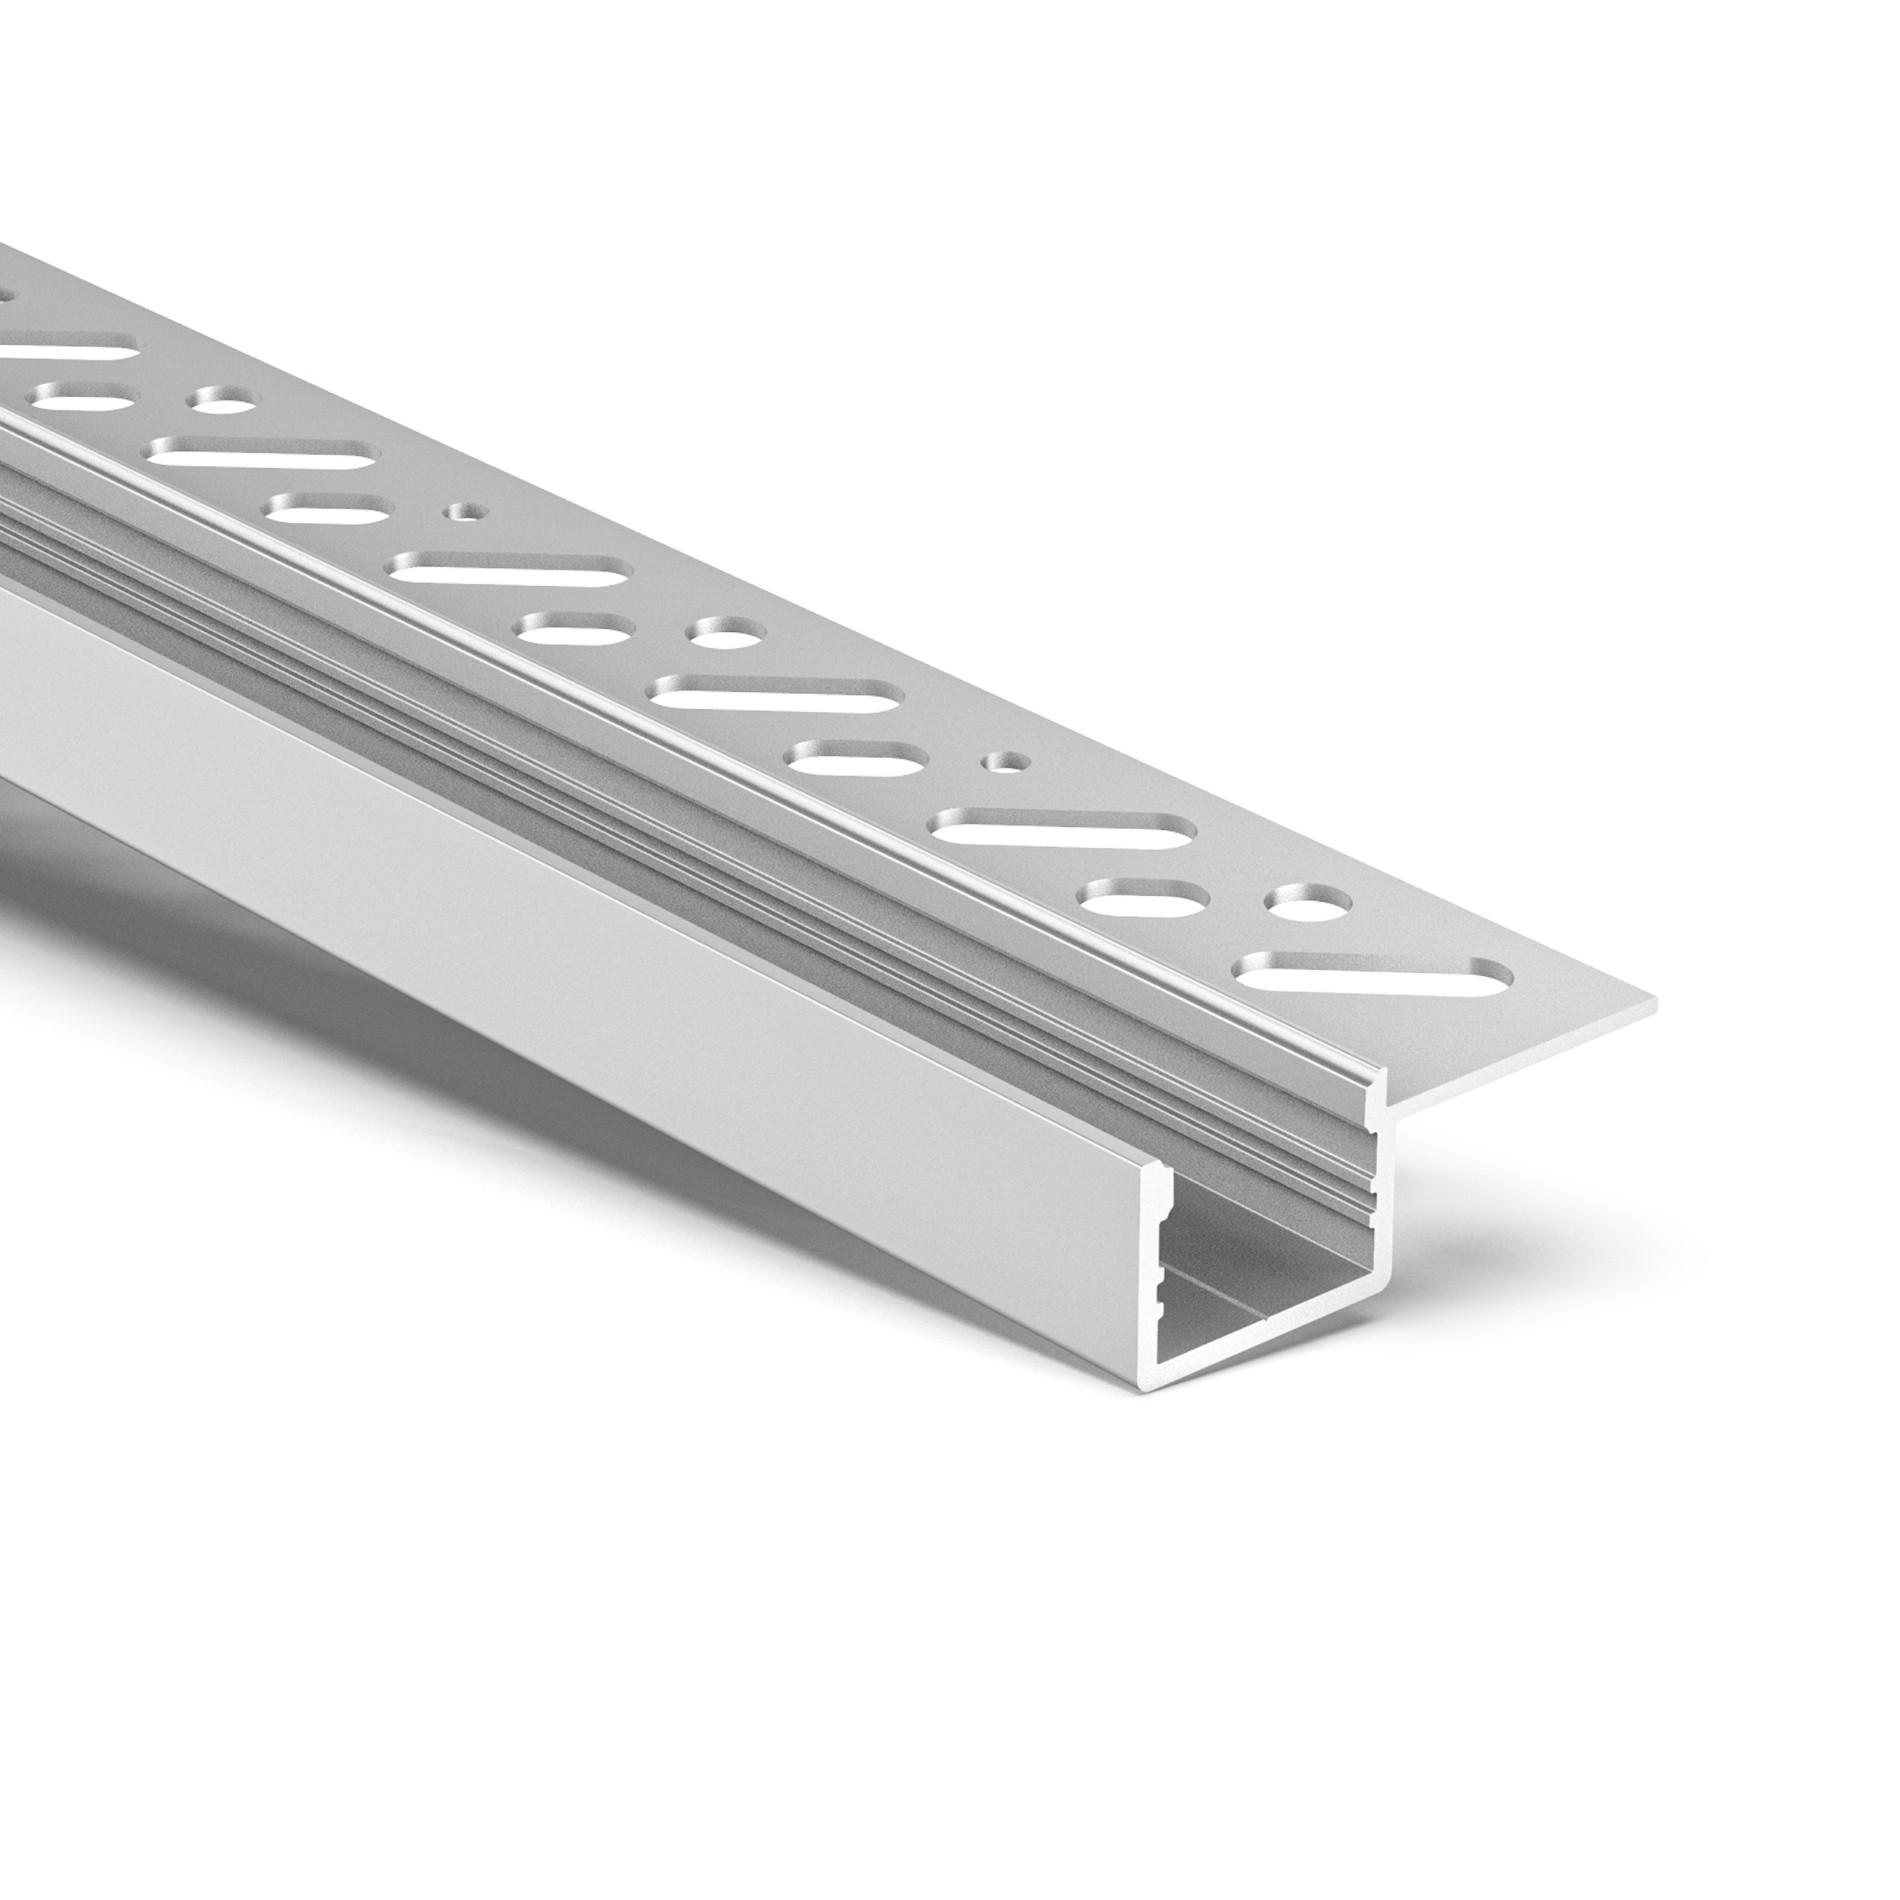 CT5S Trimless Aluminium Extrusions for recessing into plasterboard edge 38.8x13.6mm